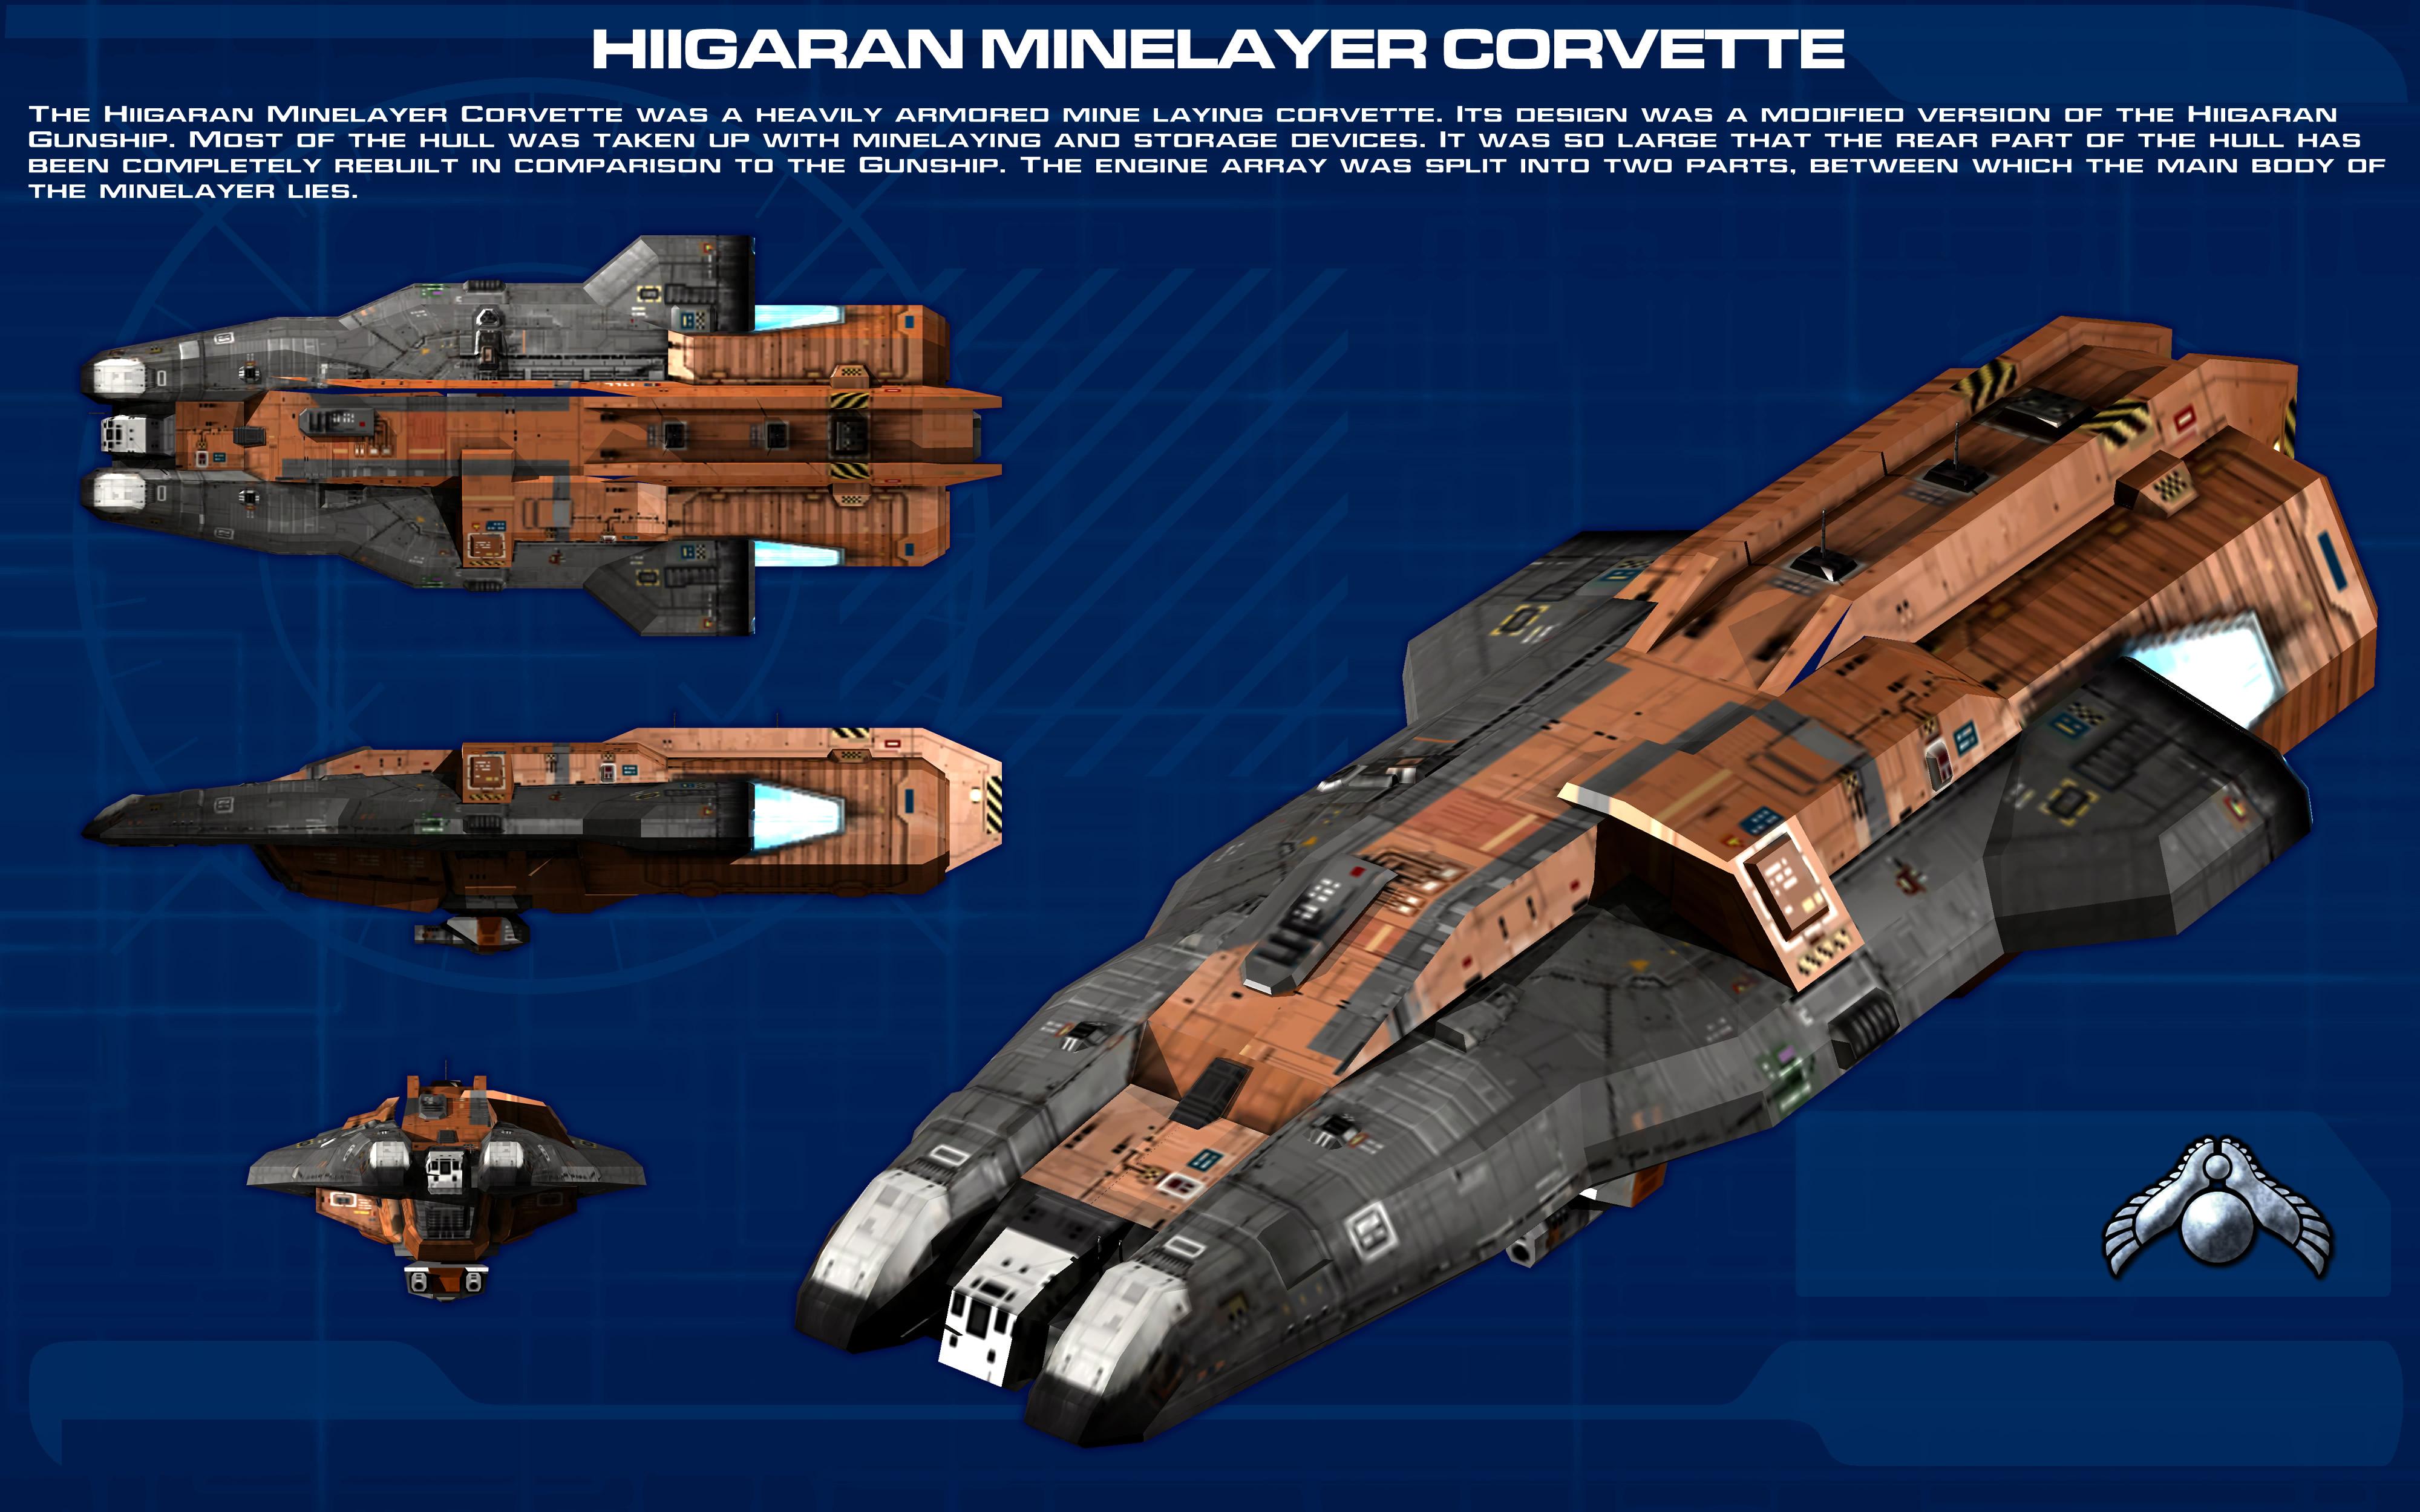 Hiigaran Minelayer Corvette ortho [new] by unusualsuspex